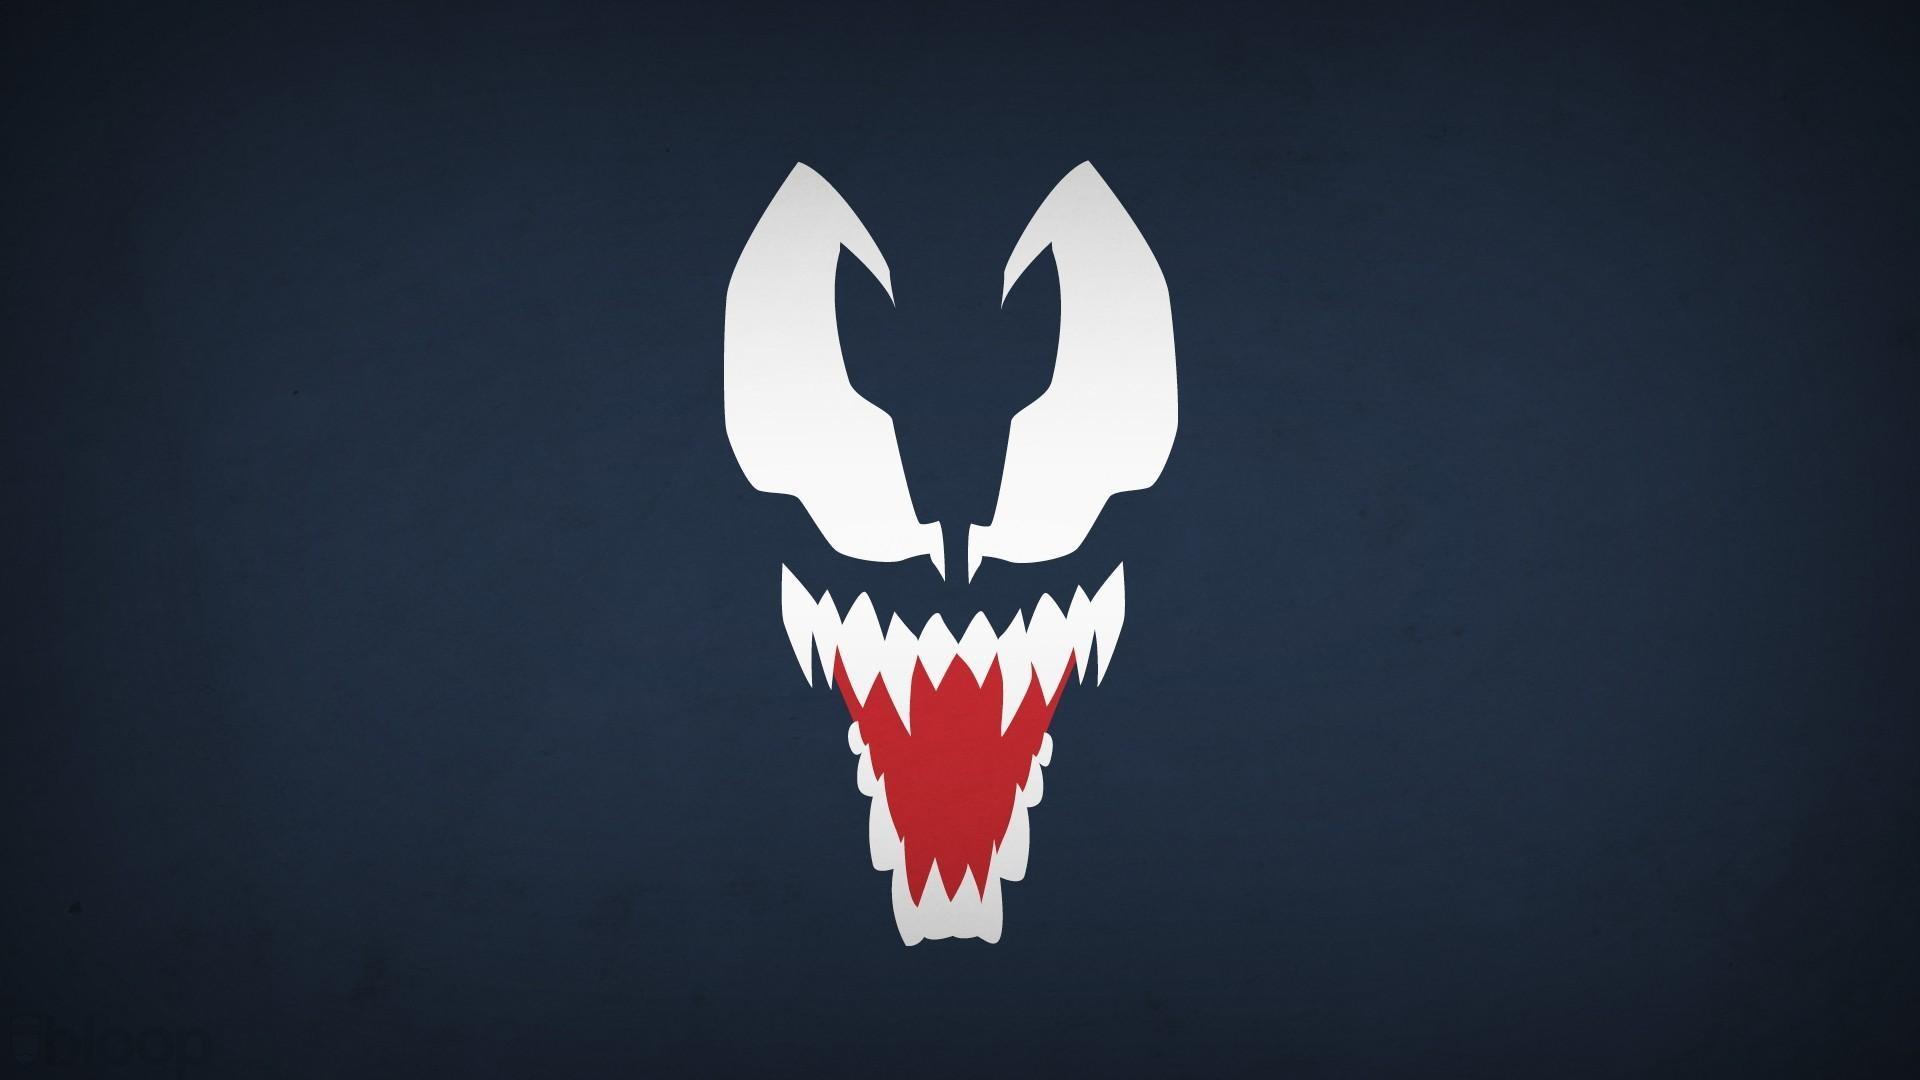 Venom marvel comics navy blue background villians blo0p wallpaper .